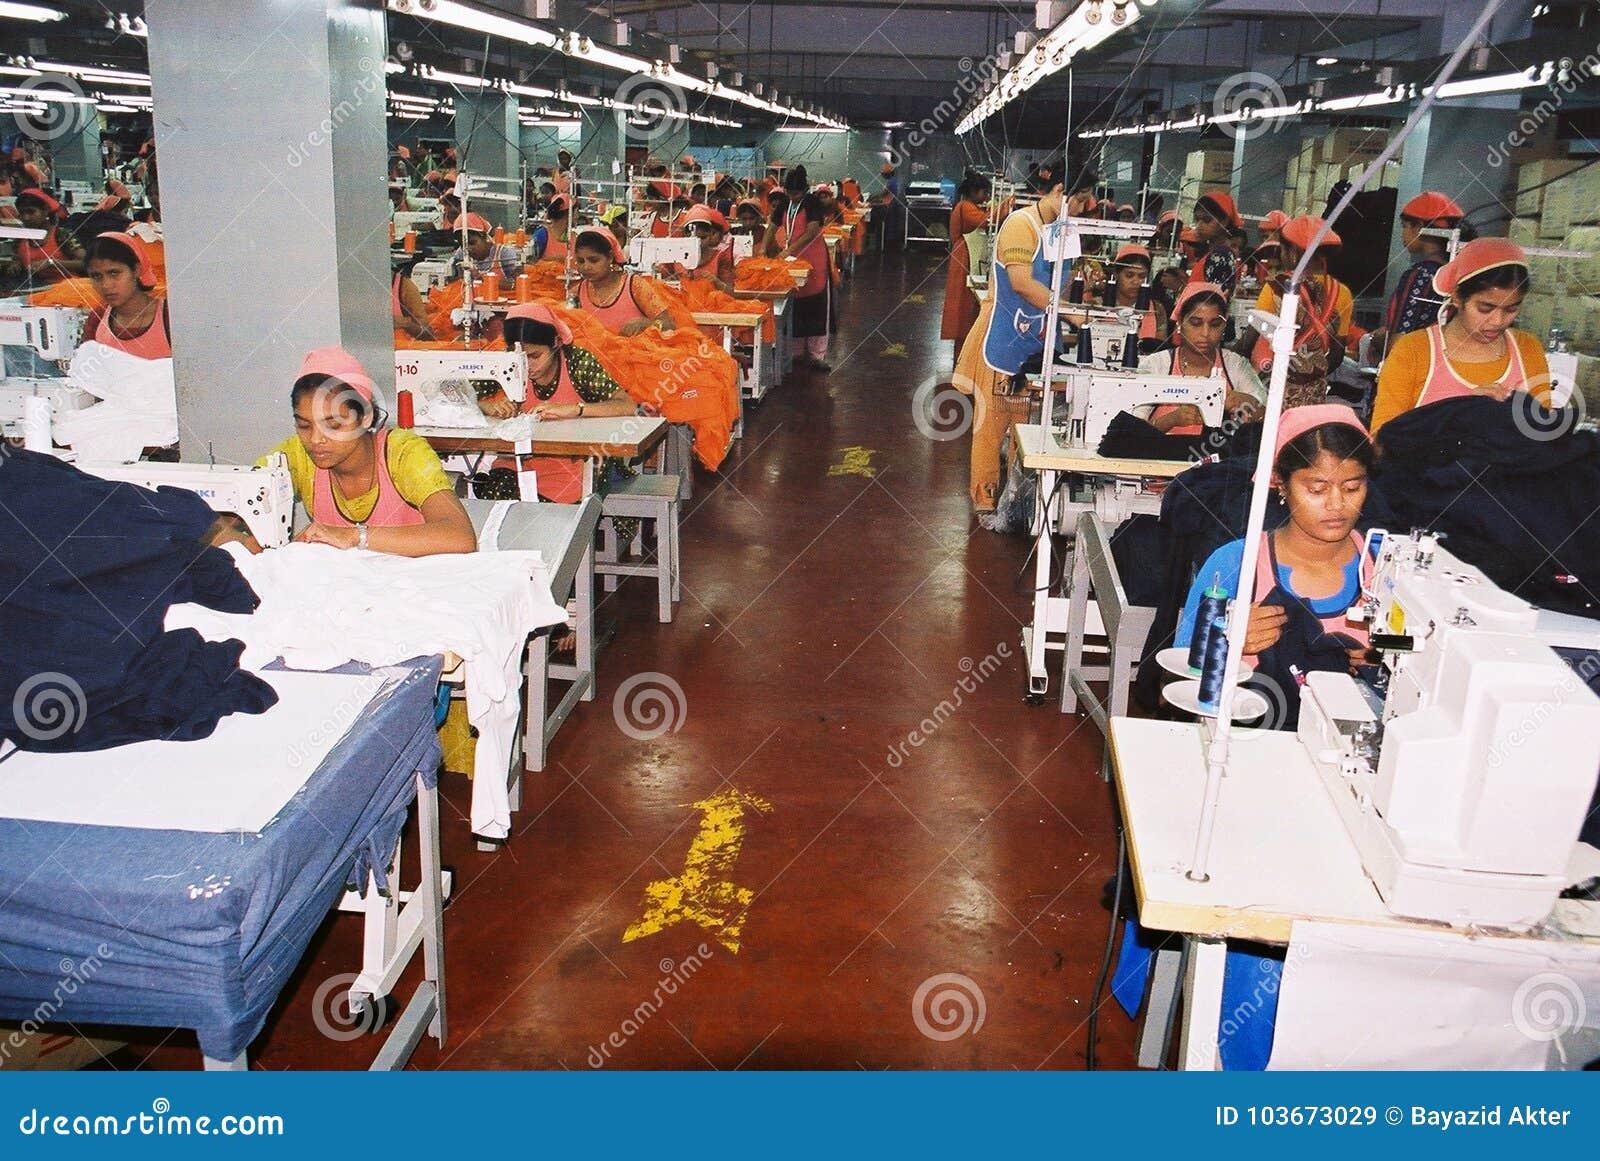 Garments industry in Bangladesh